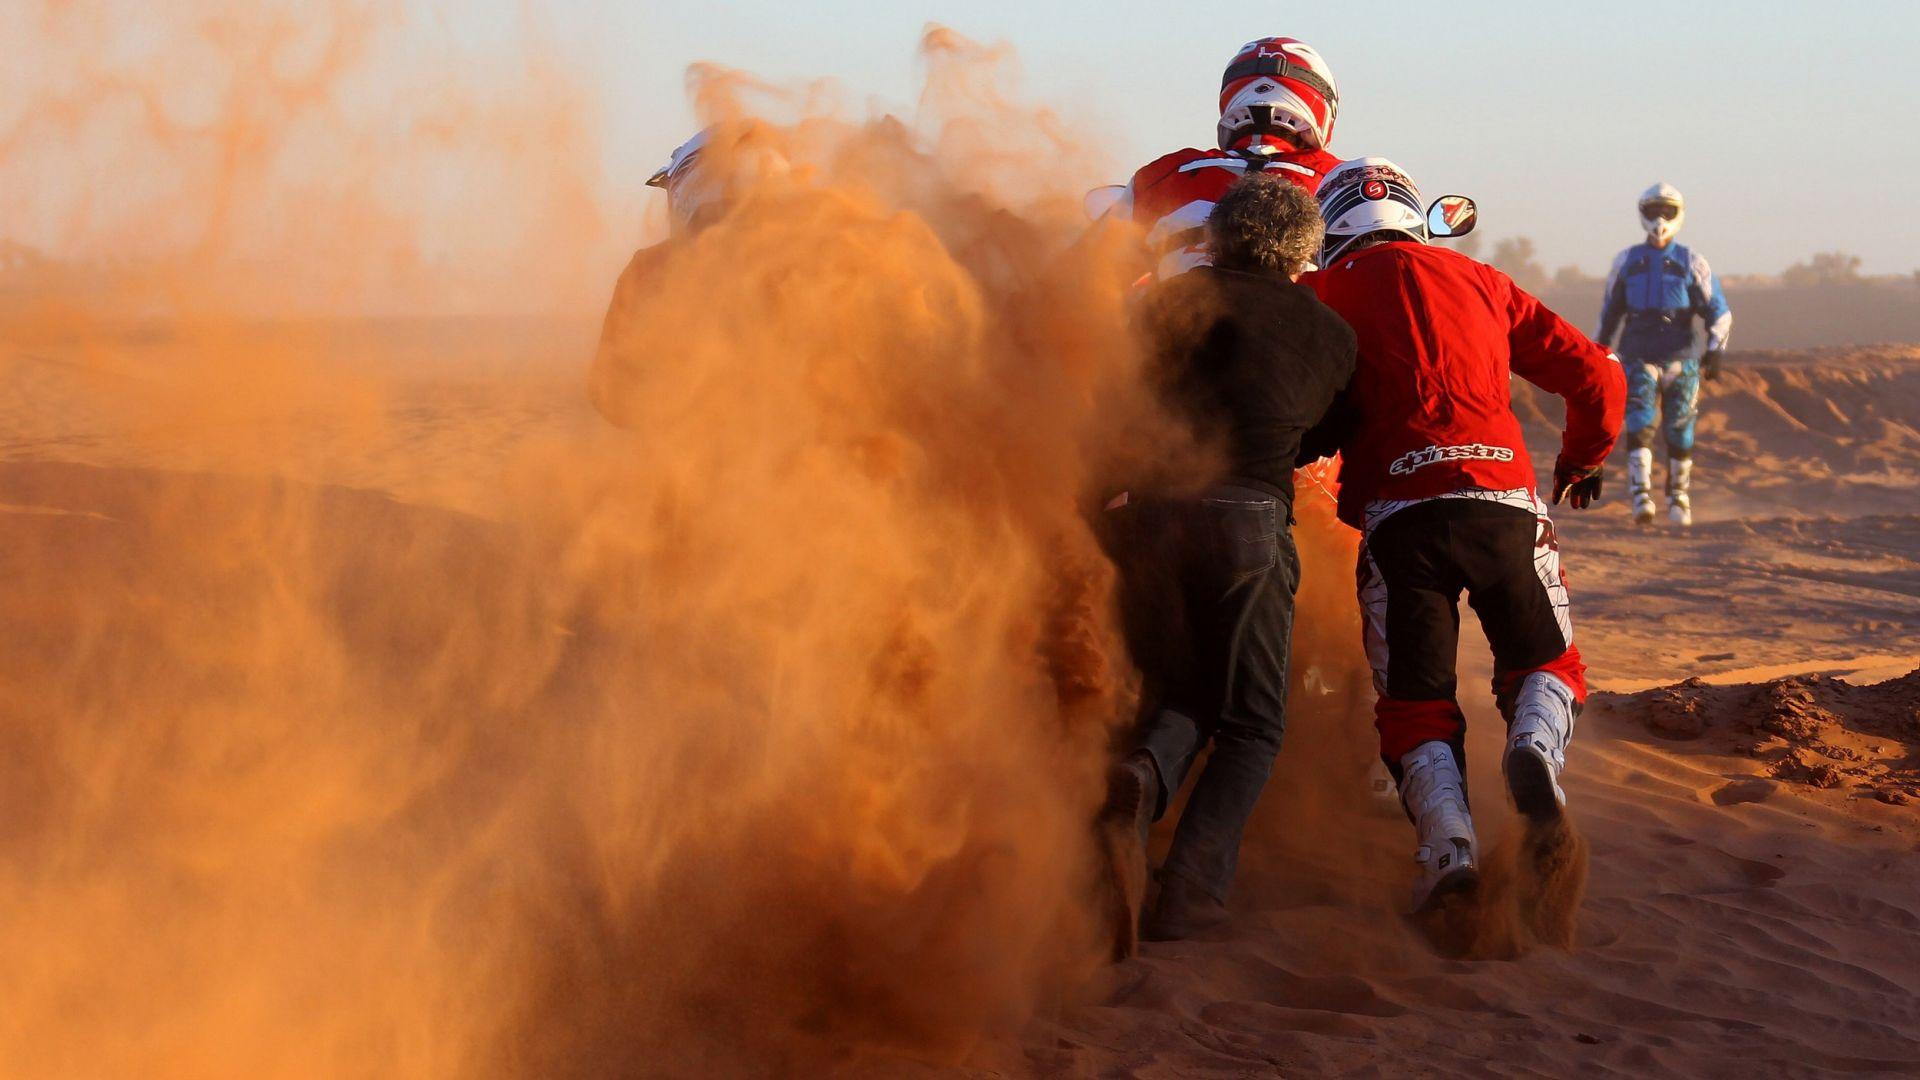 Immagine 72: In Marocco con la Yamaha Super Ténéré